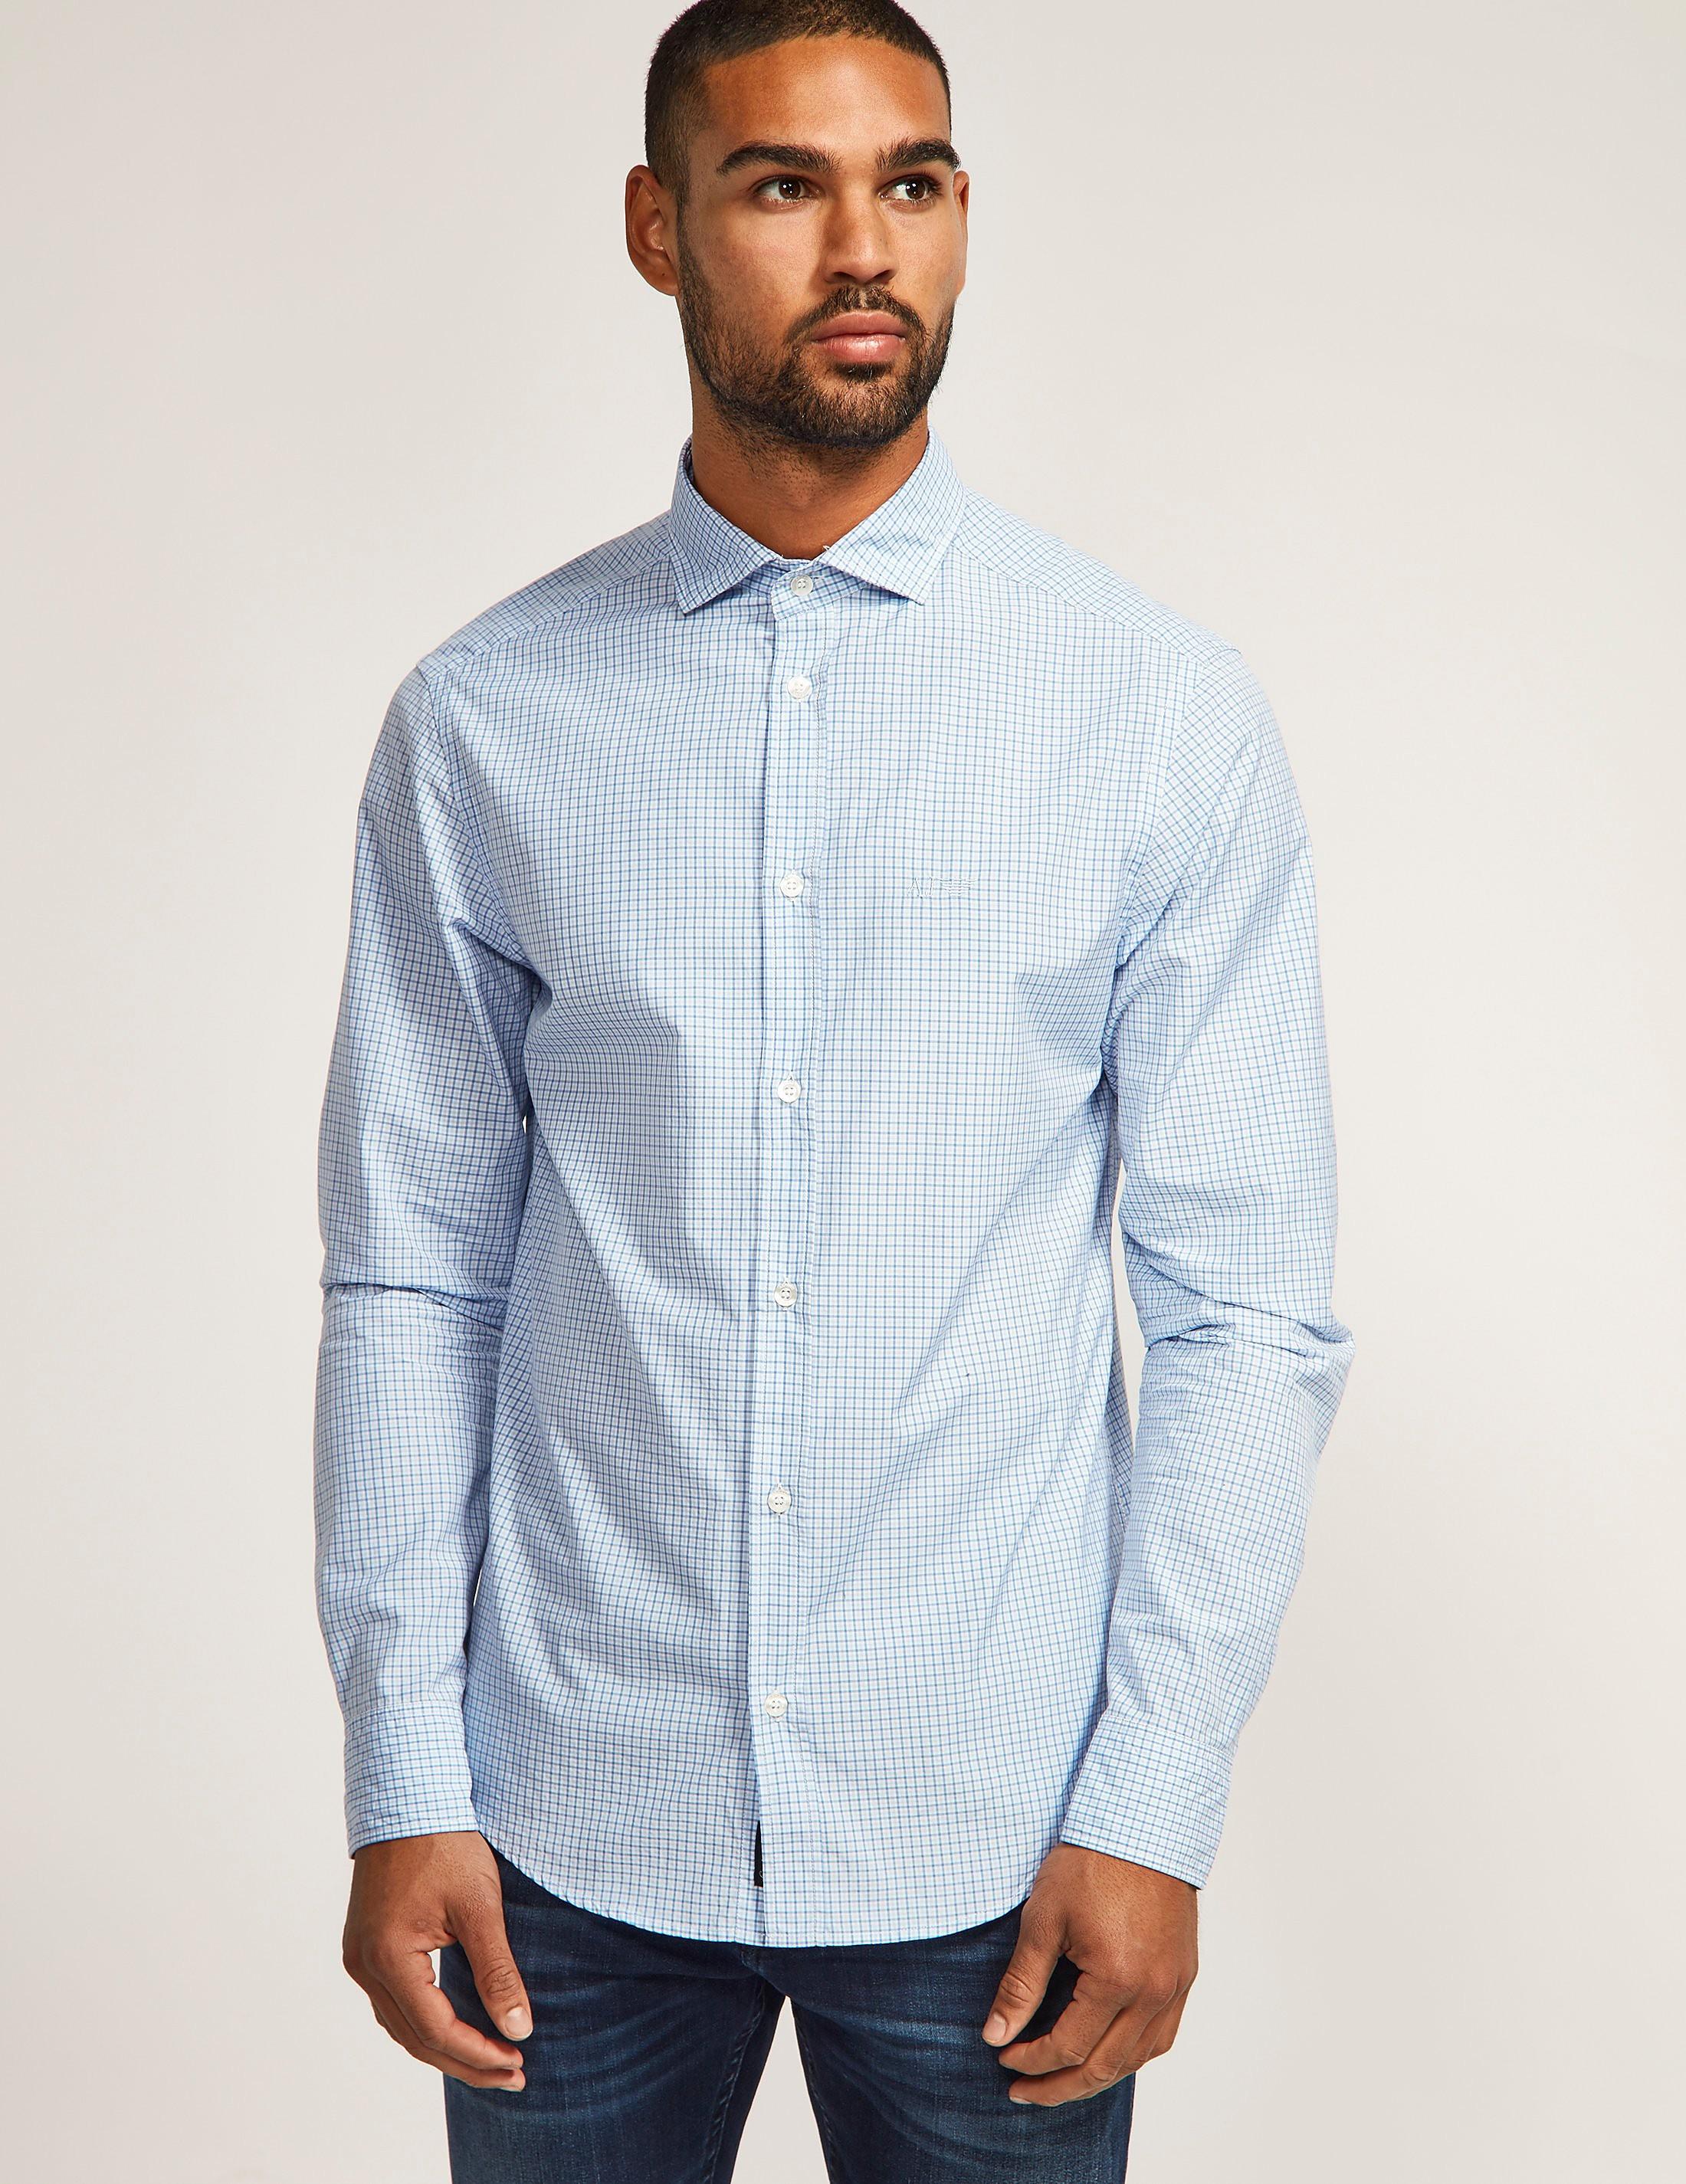 Armani Jeans Custom Fit Long Sleeve Shirt